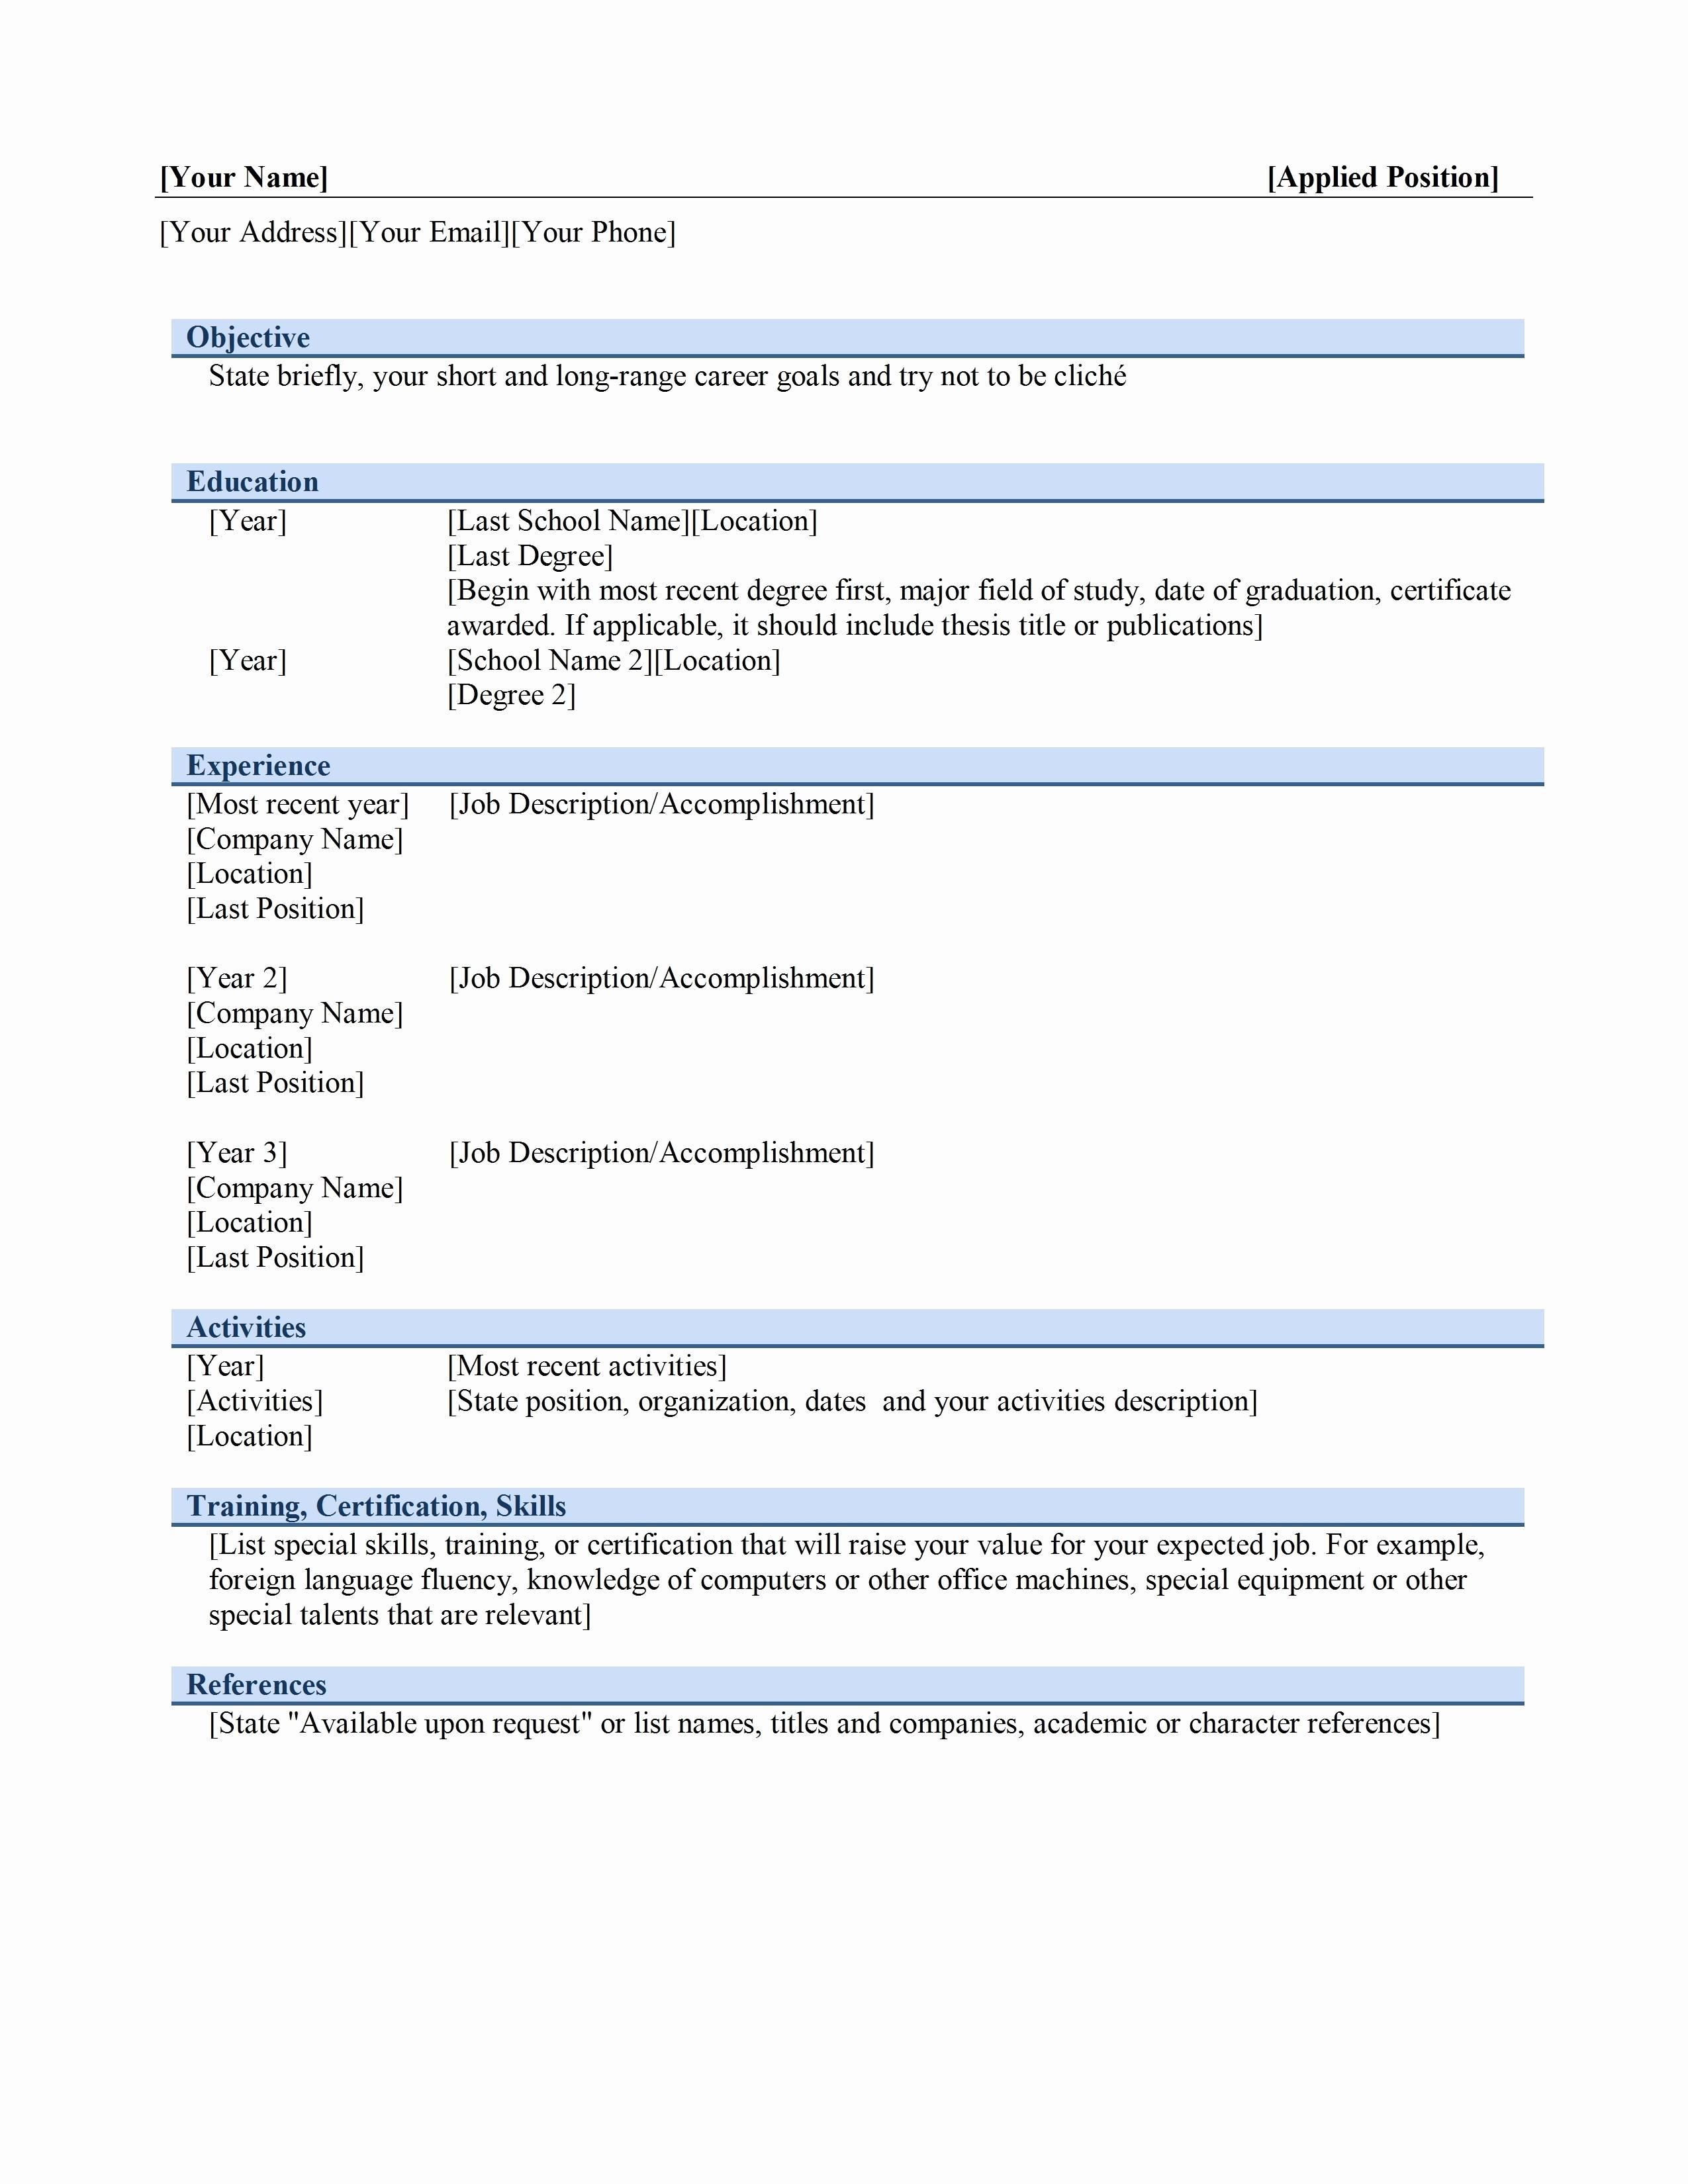 Microsoft Office Word Resume Templates Unique Resume Templates Microsoft Fice Word 2003 Bongdaao